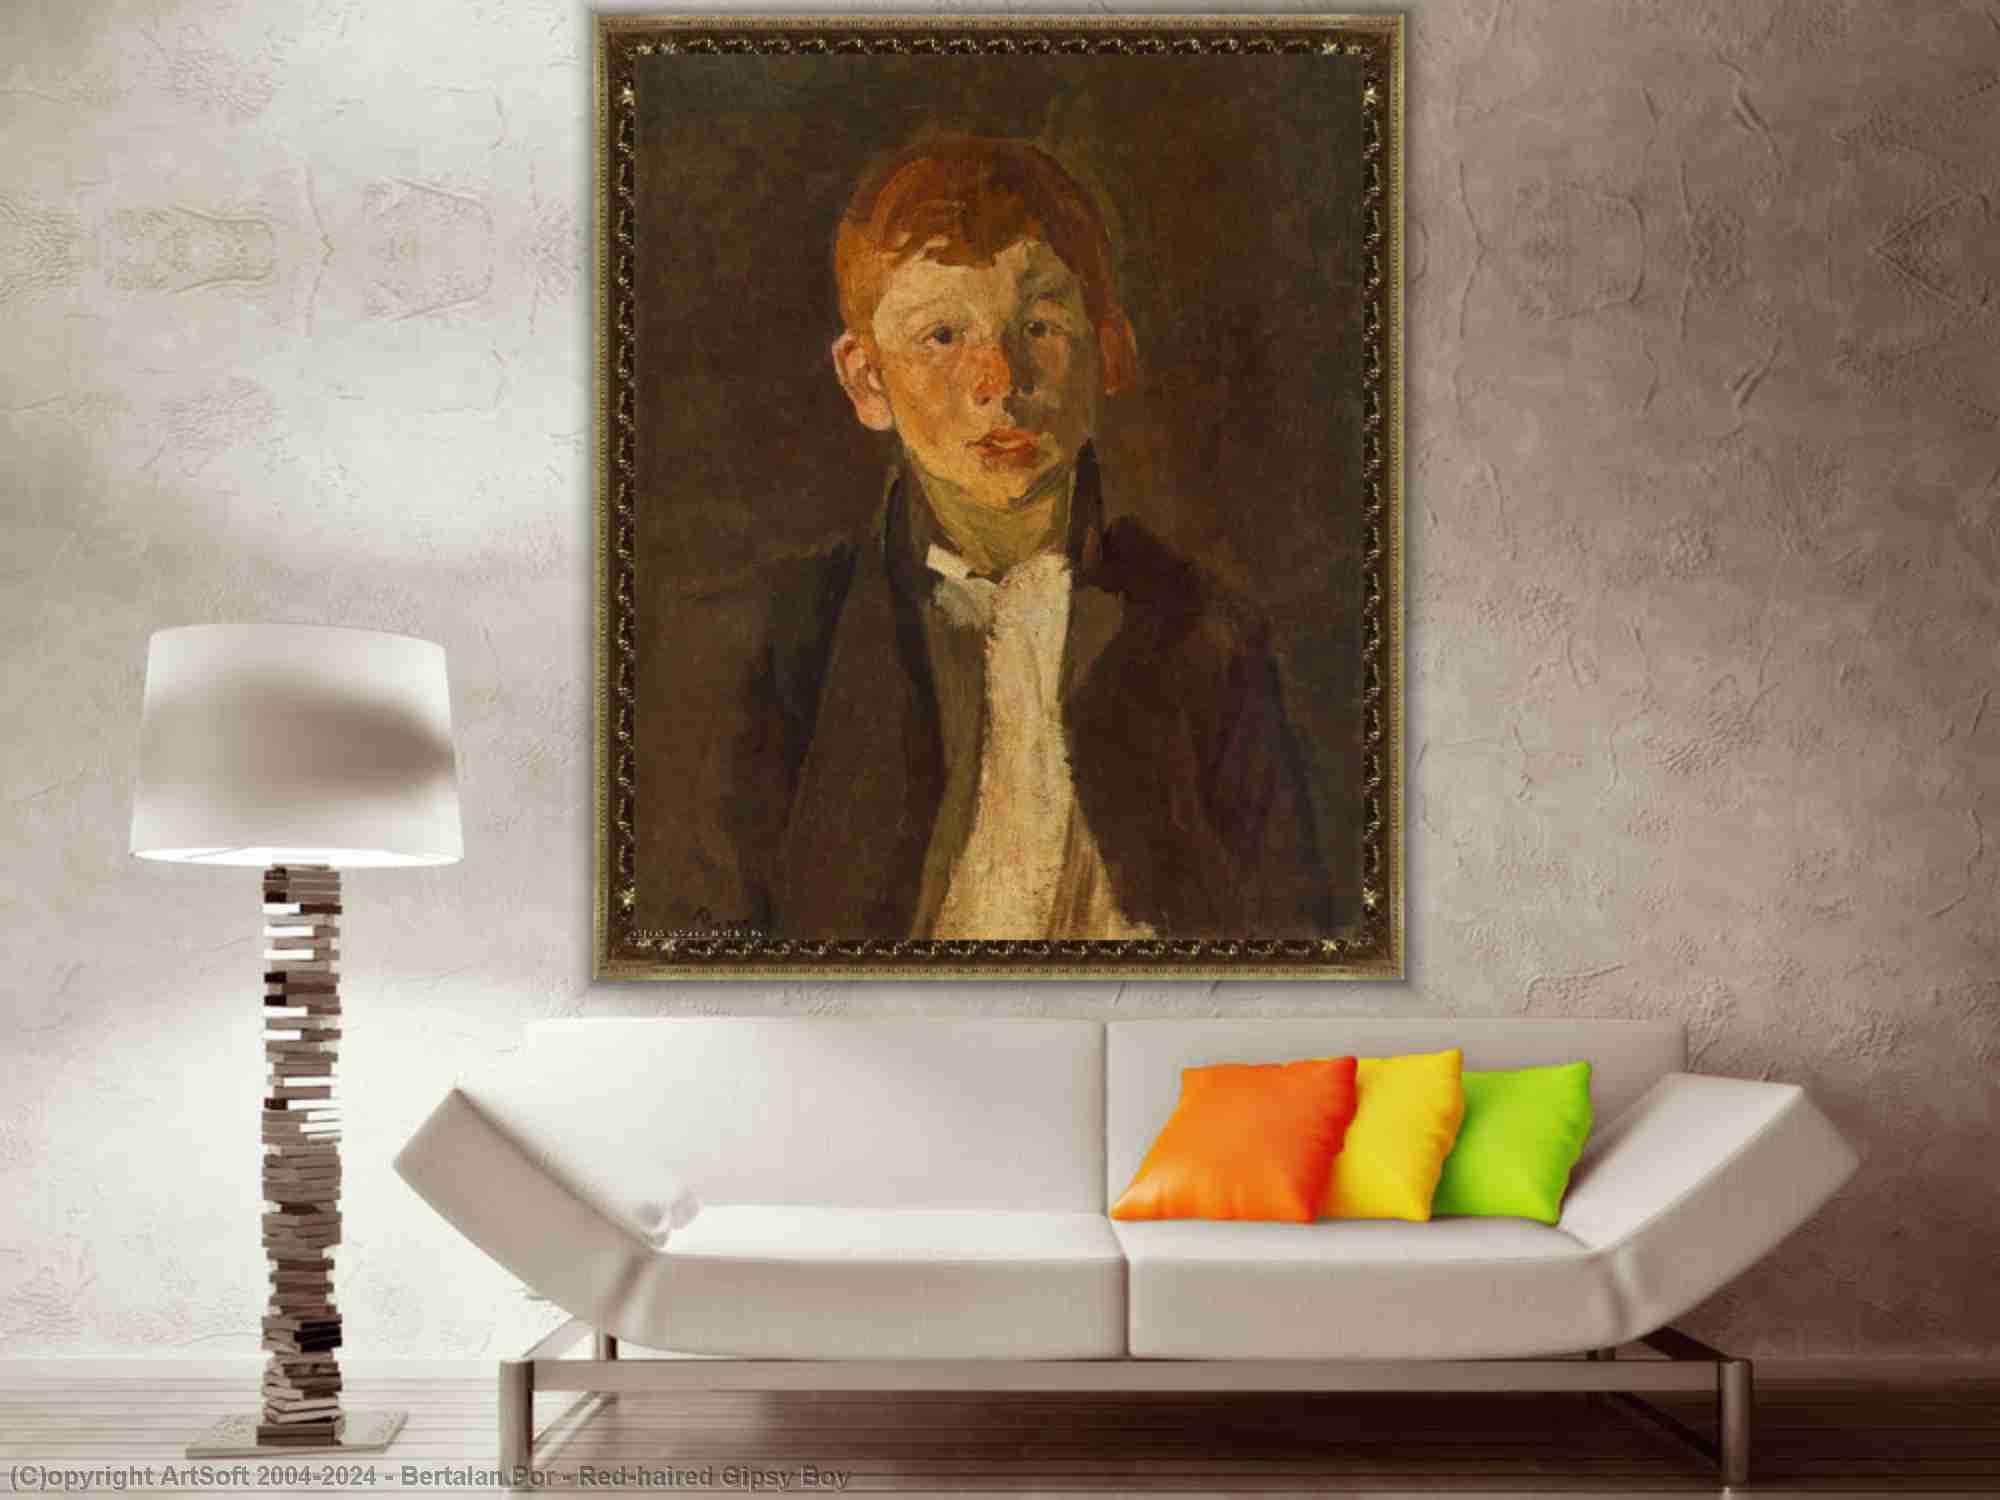 Bertalan Por - Red-haired Gipsy Boy